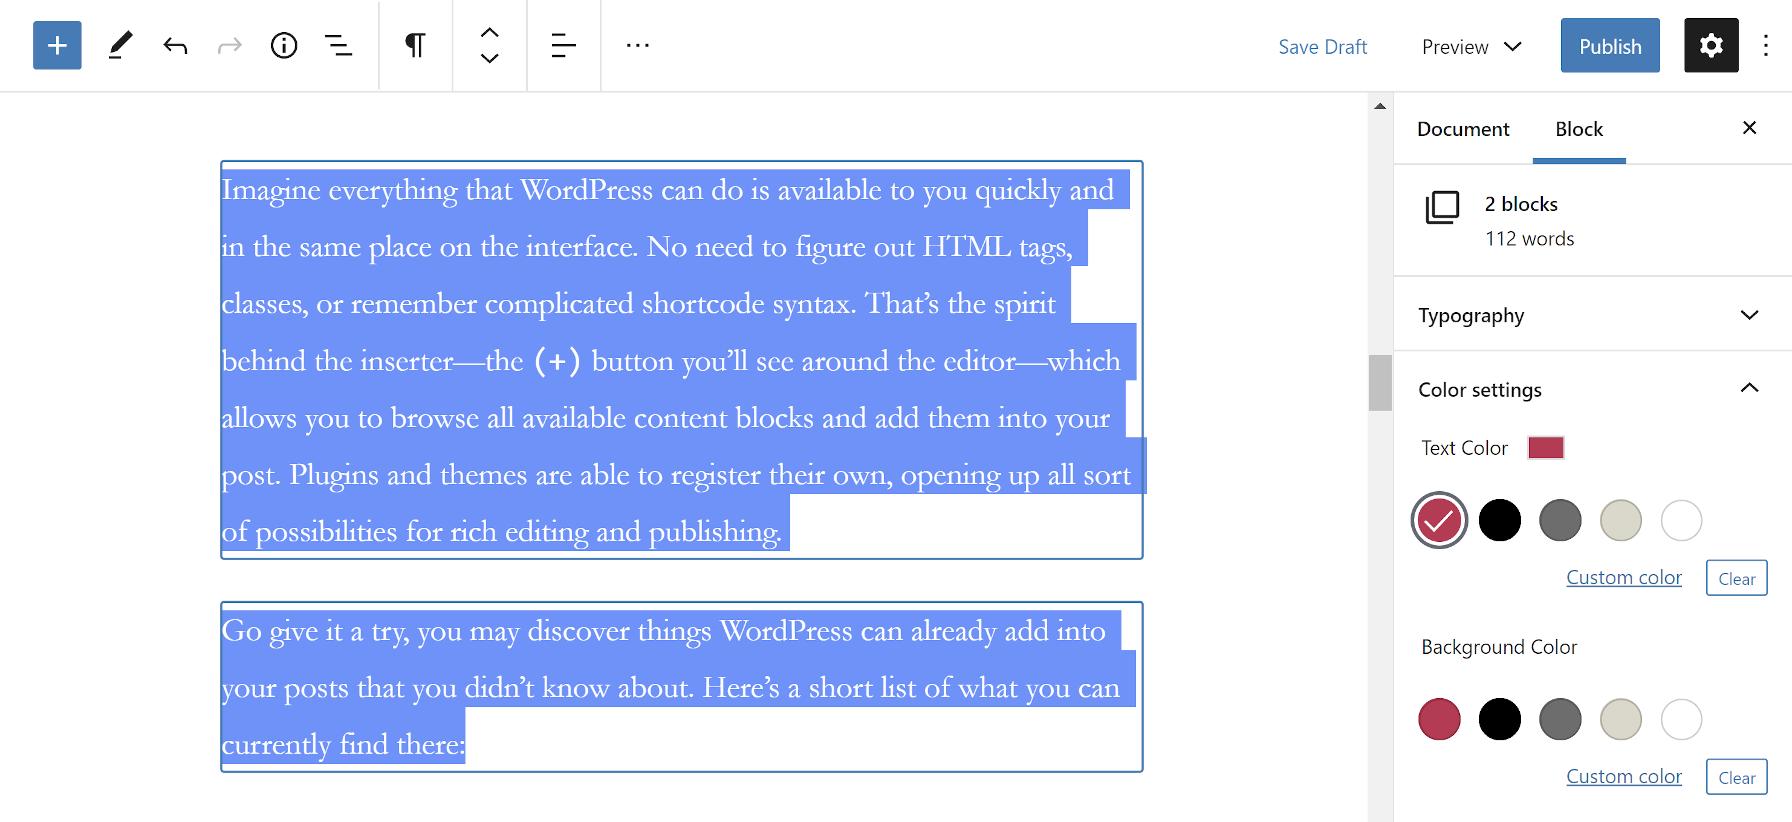 gutenberg-8-4-添加图像编辑包括多个块控件并启用块目录搜索Gutenberg 8.4添加图像编辑,包括多块控件并启用块目录搜索